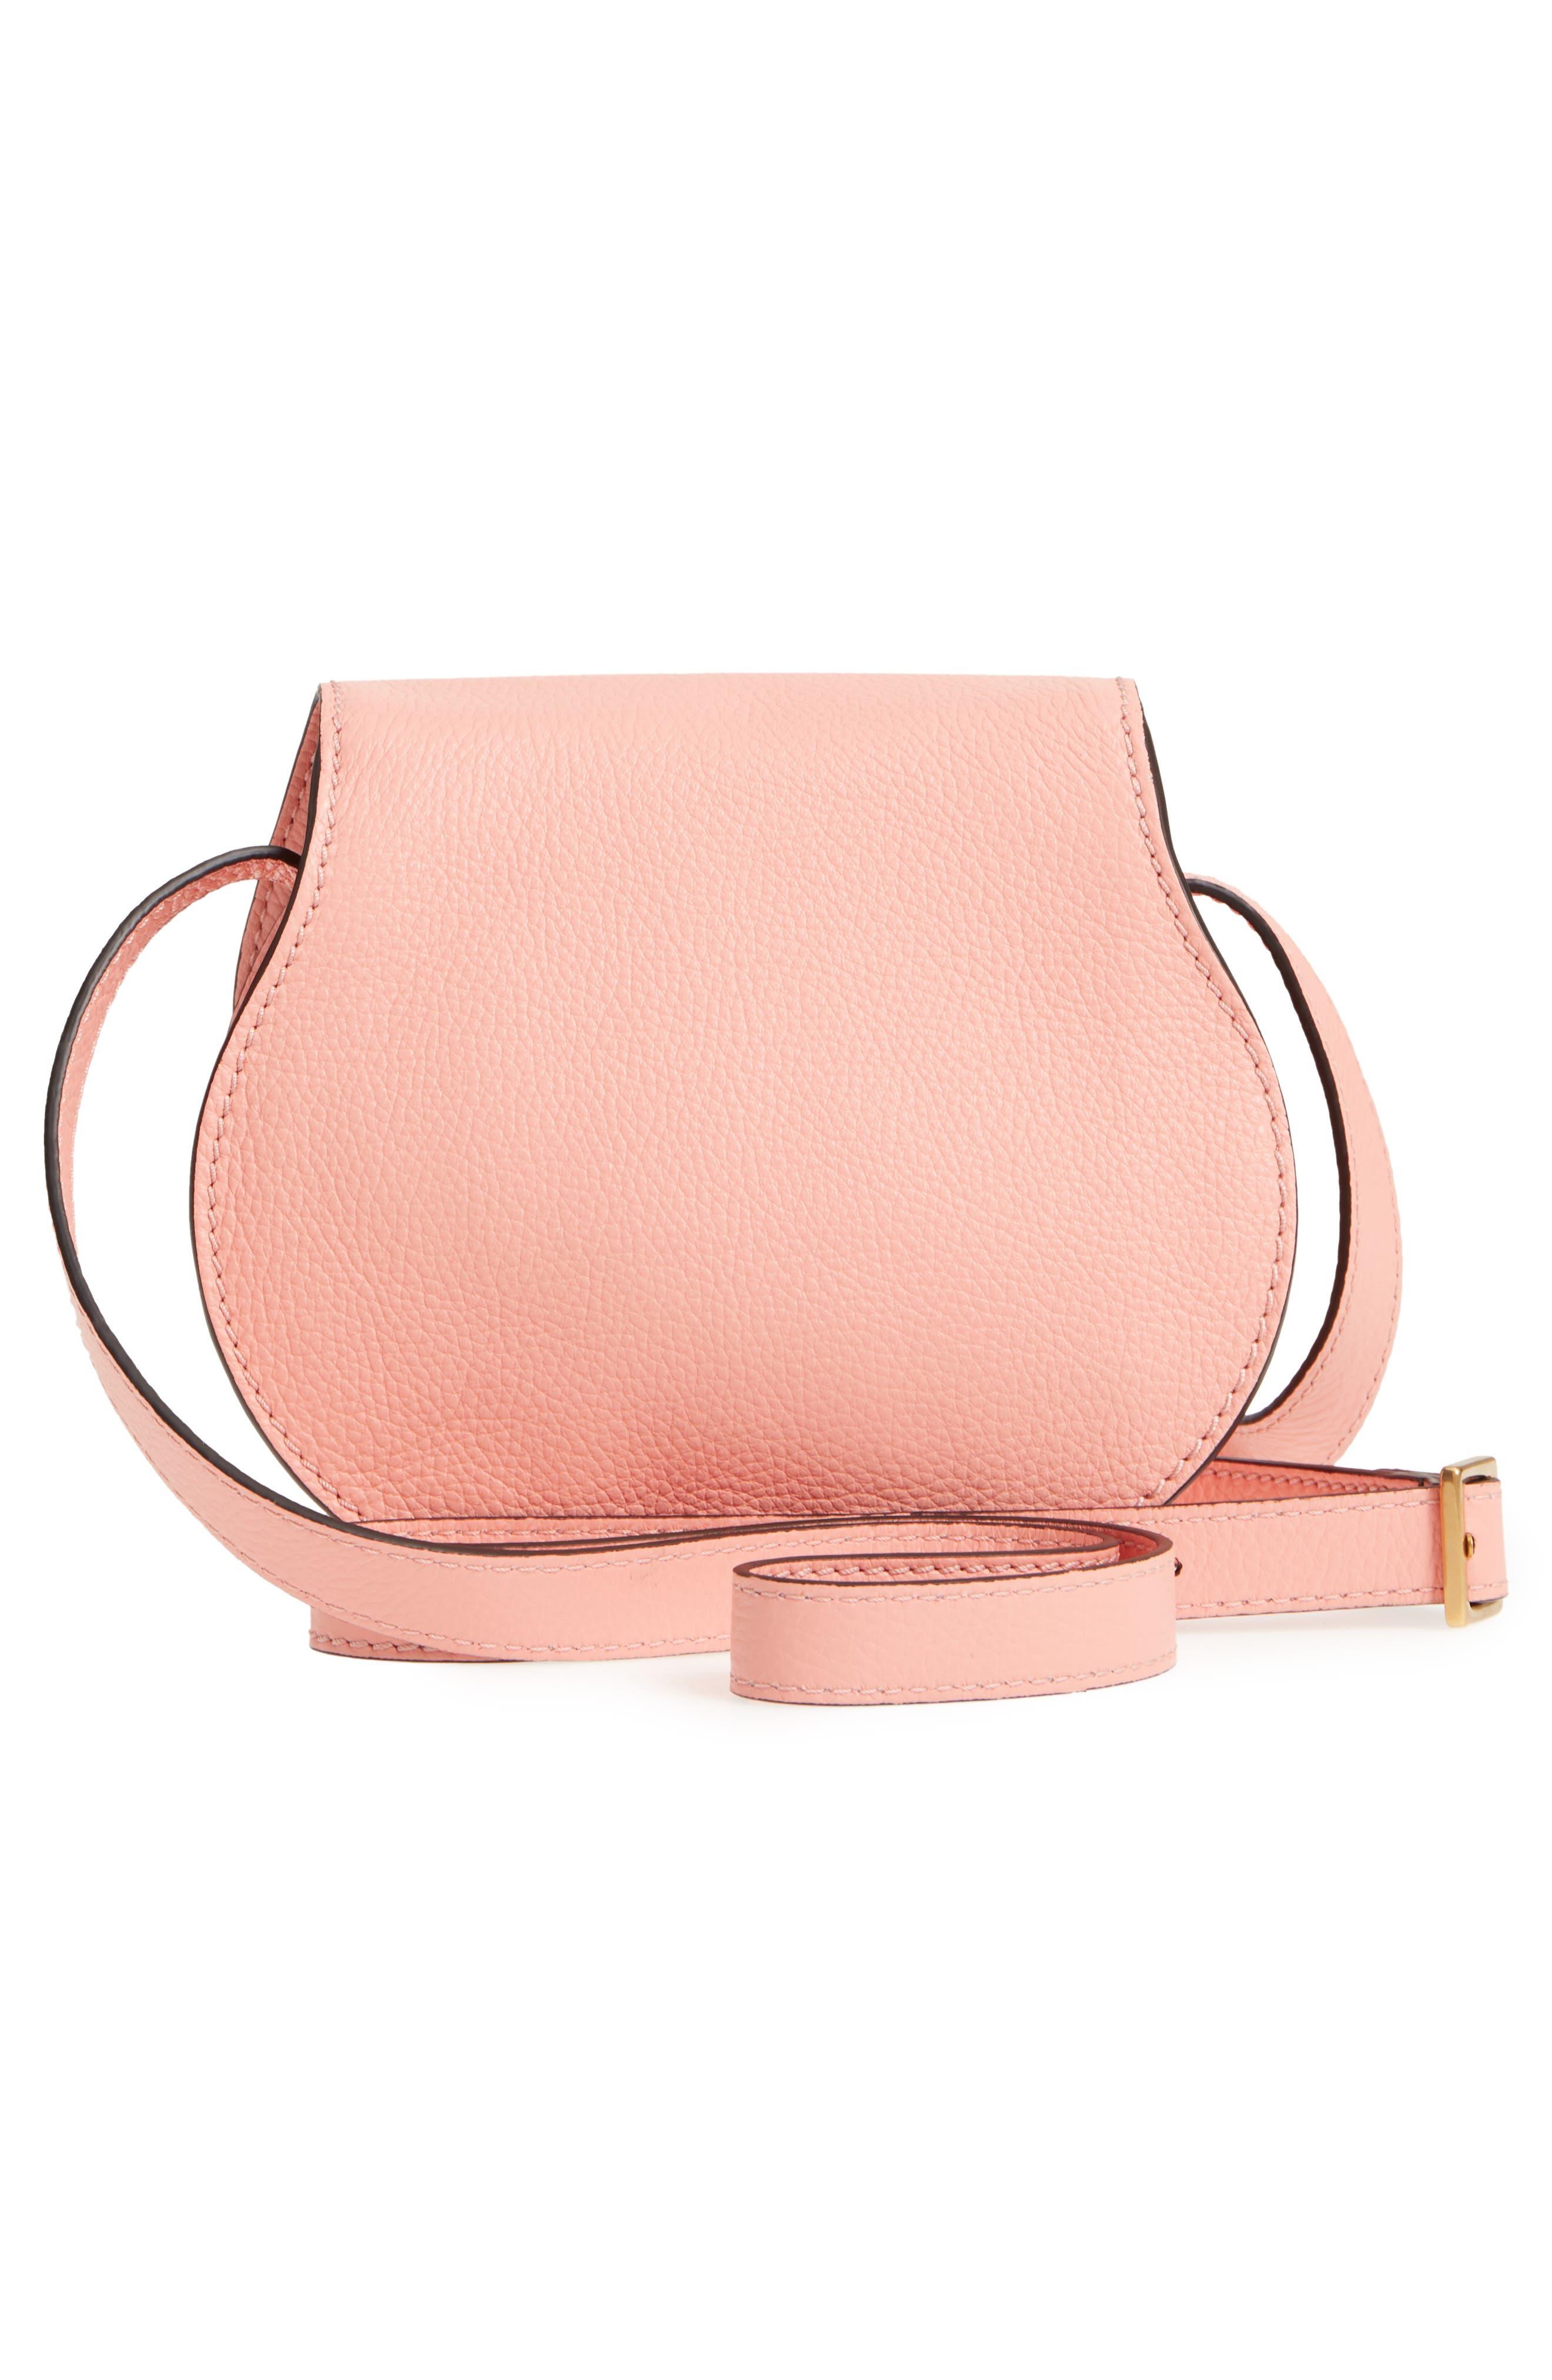 'Mini Marcie' Leather Crossbody Bag,                             Alternate thumbnail 3, color,                             Ideal Blush